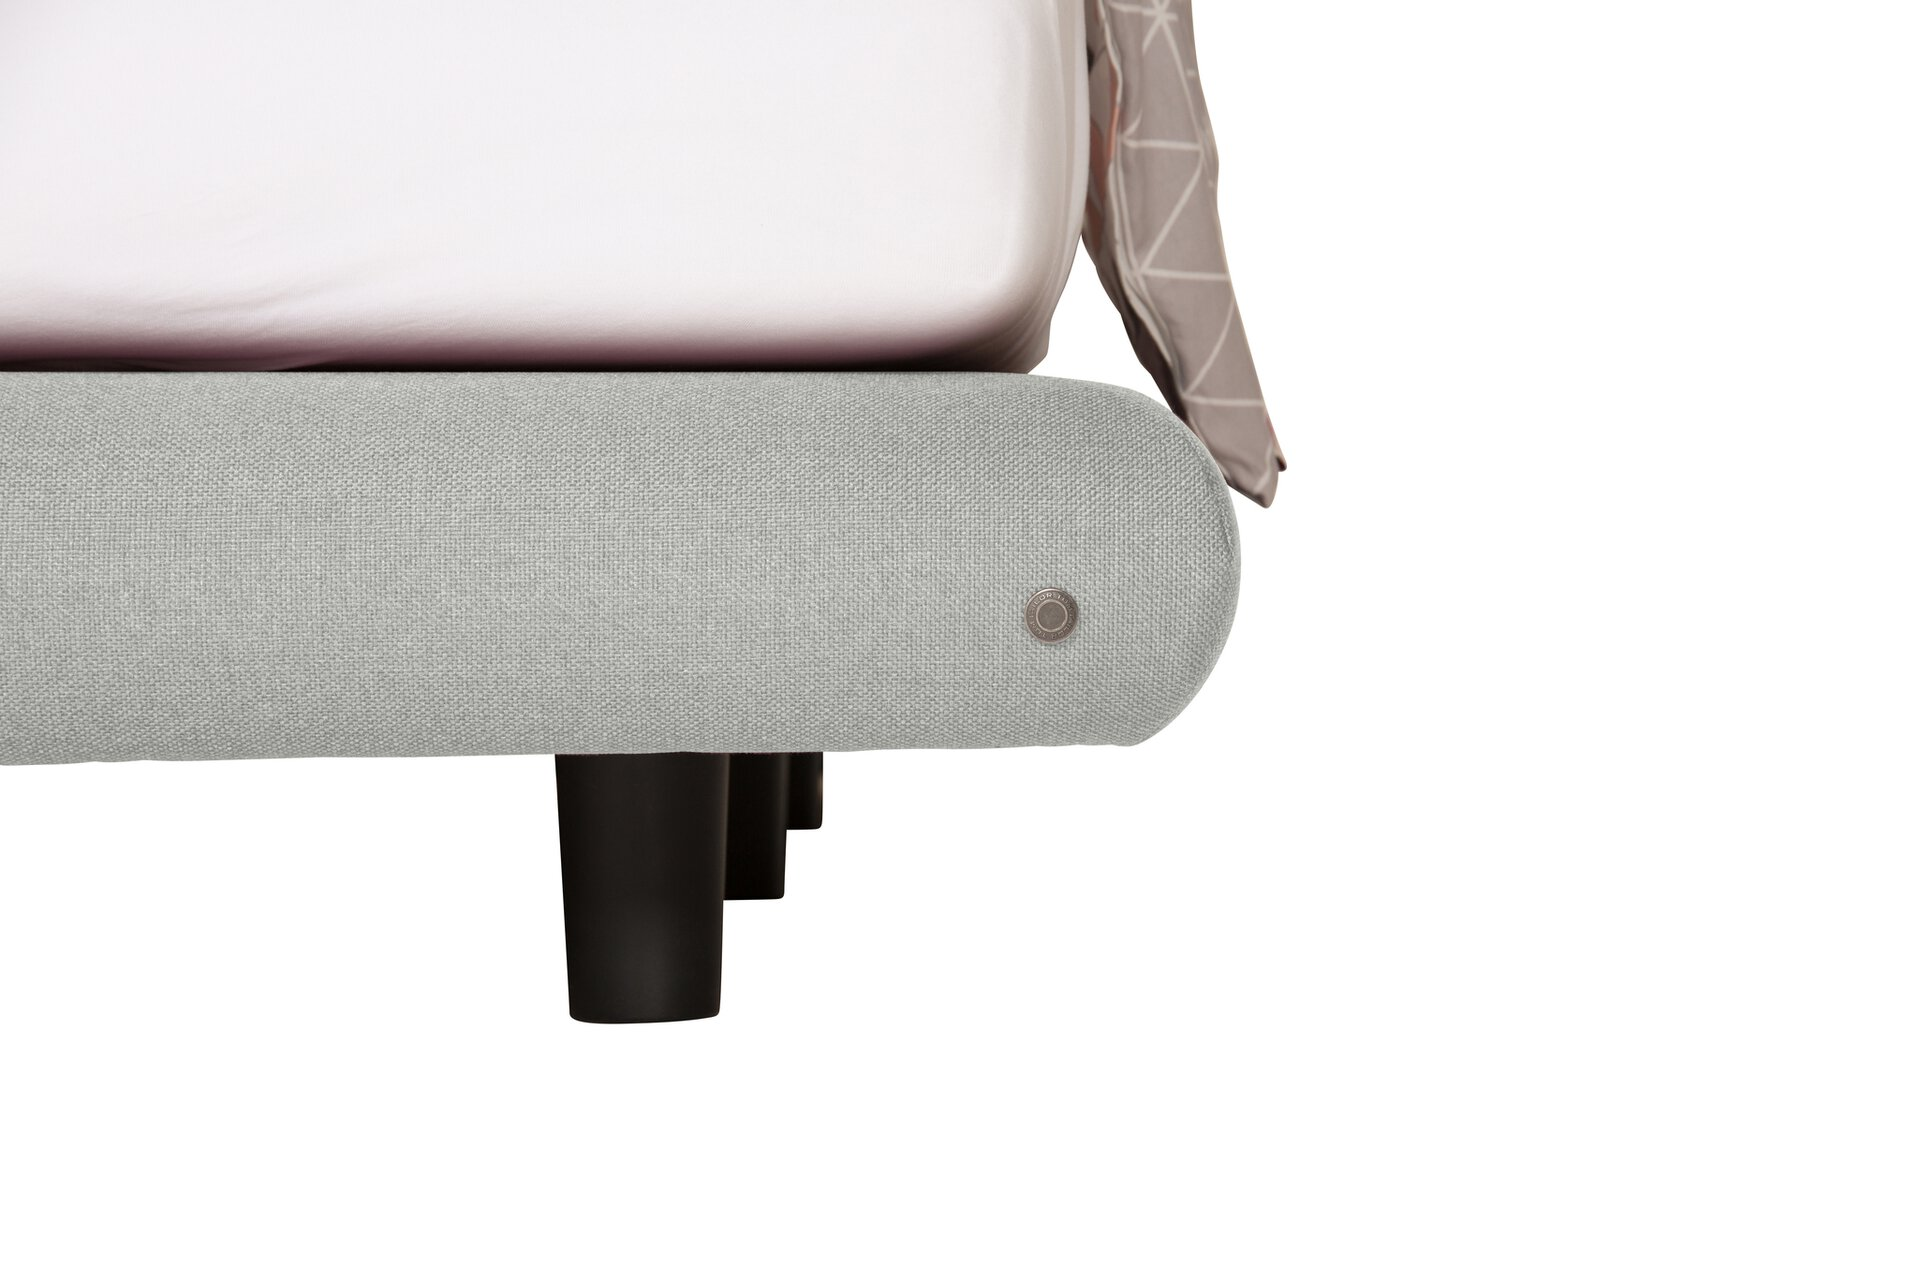 Boxspringbett SOHO PILLOW Tom Tailor Textil grau 206 x 120 x 227 cm